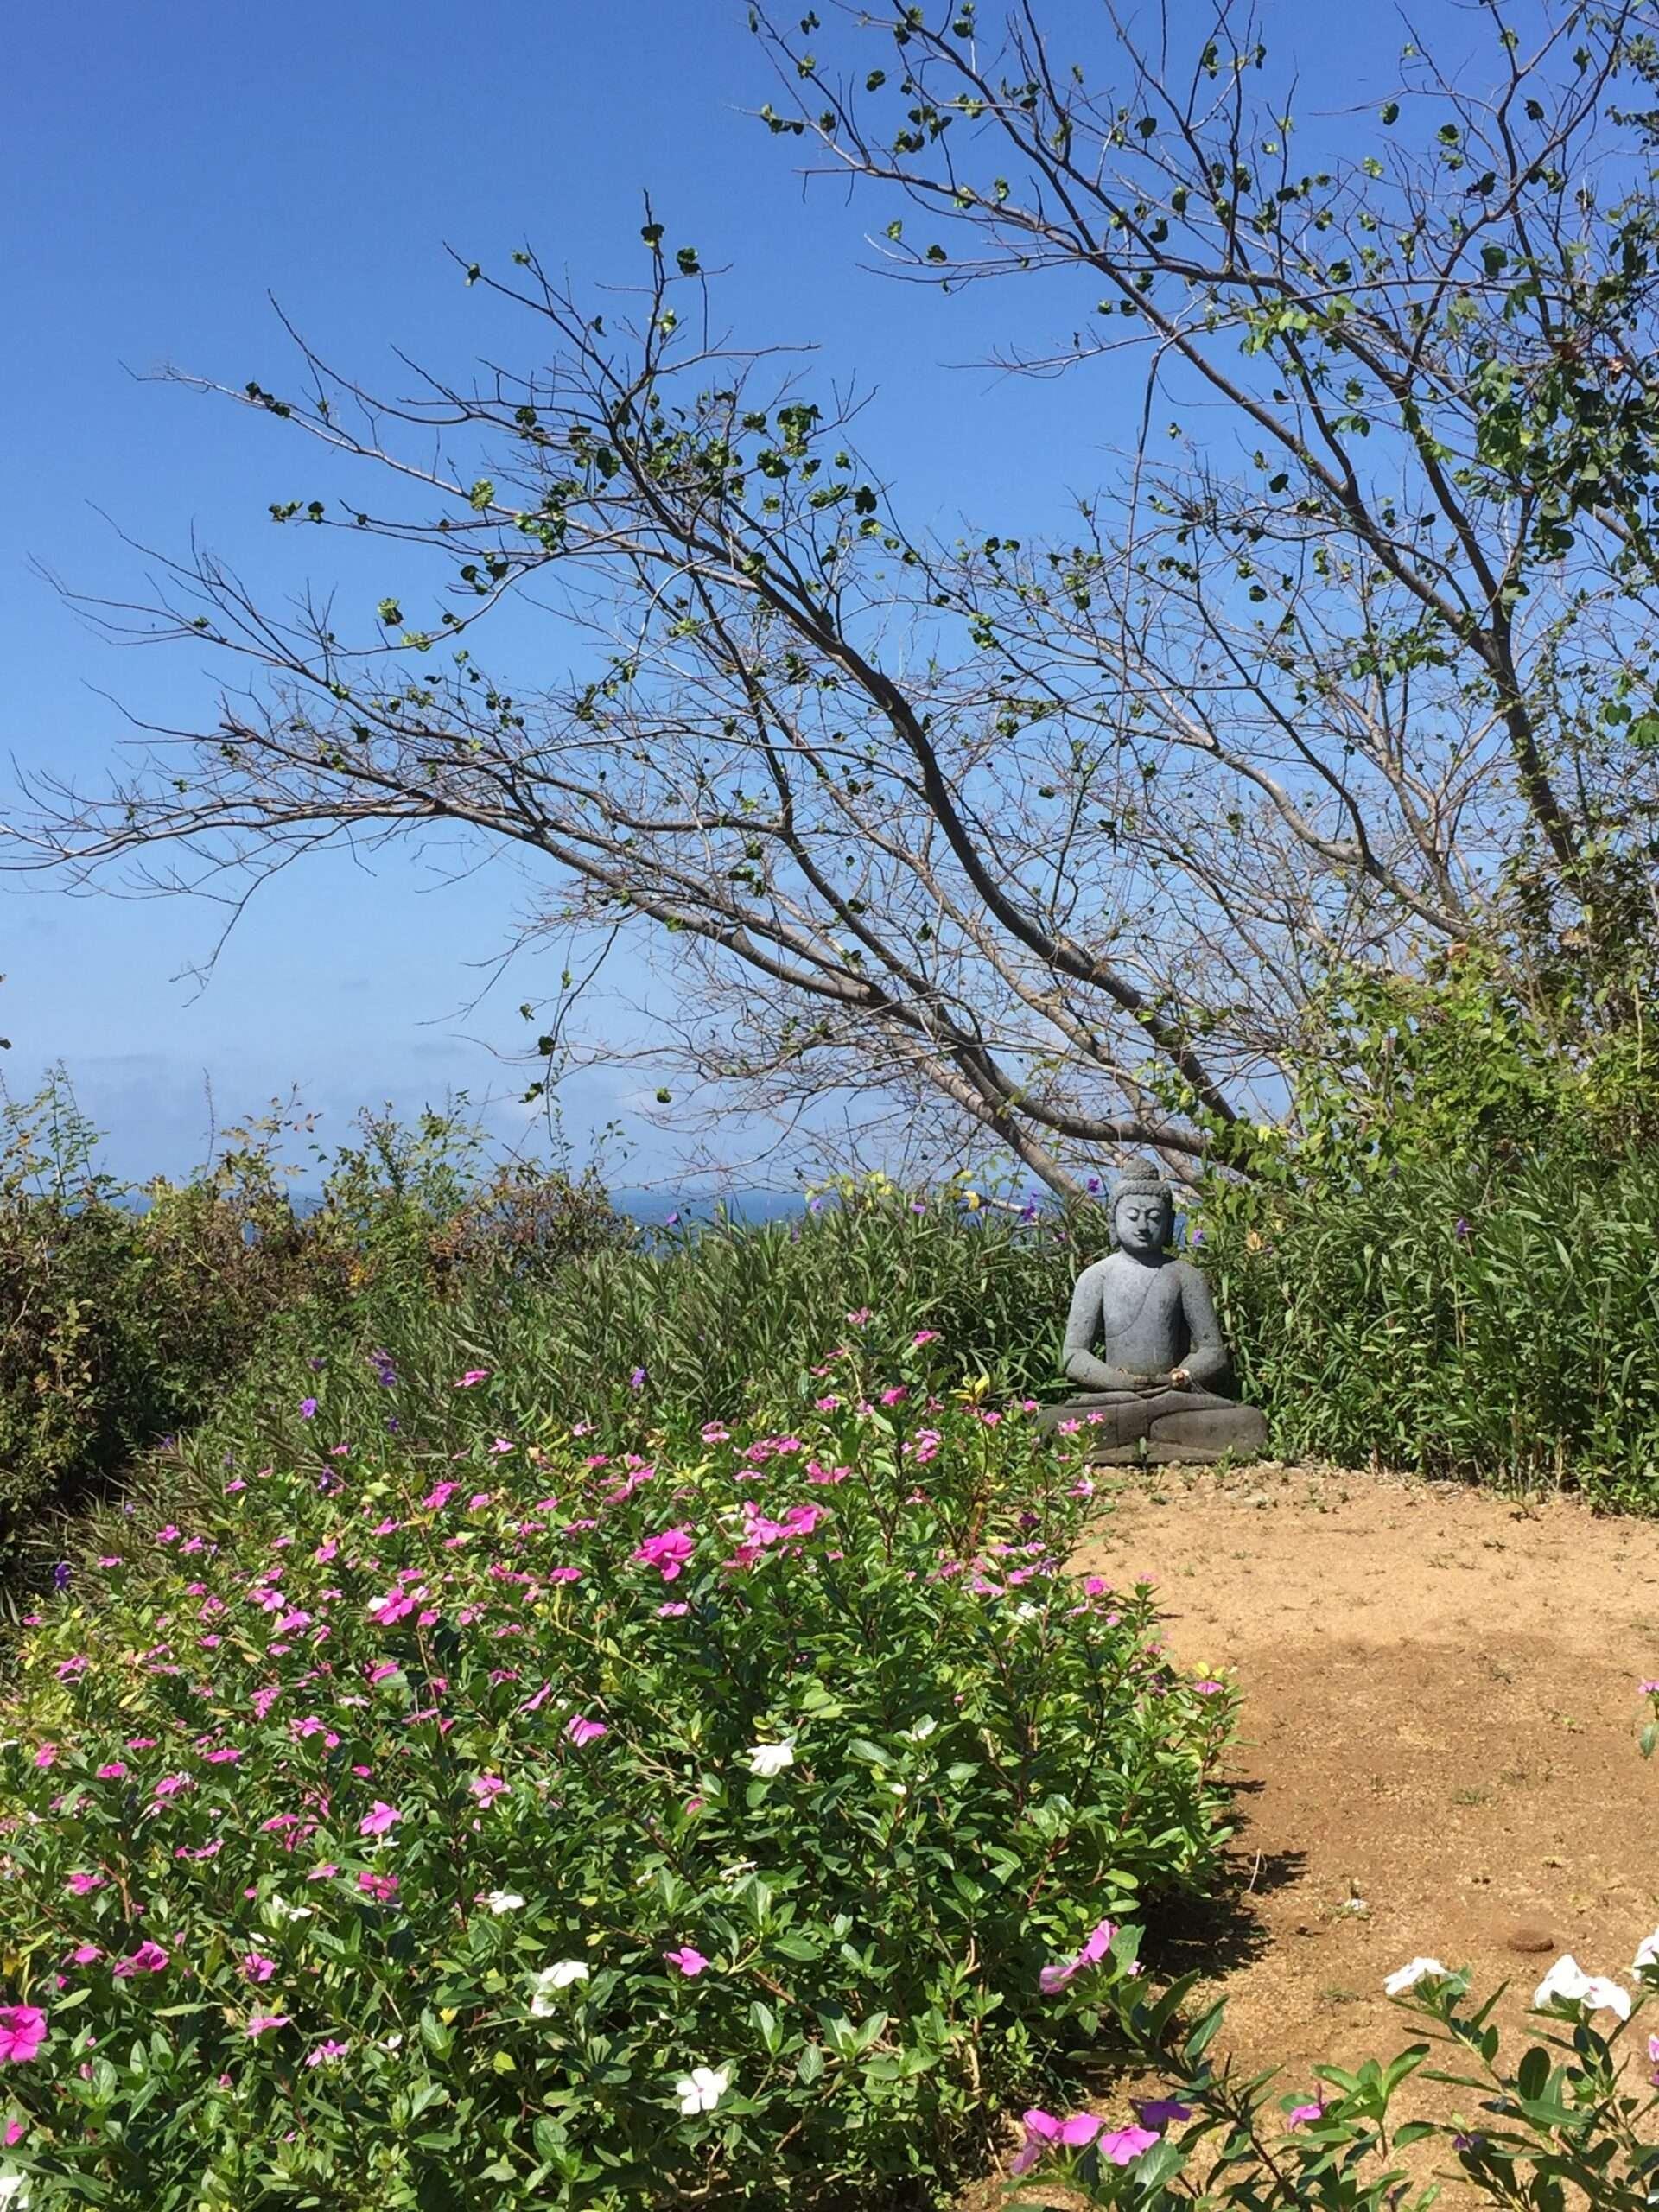 haramara retreat buddha statue on path